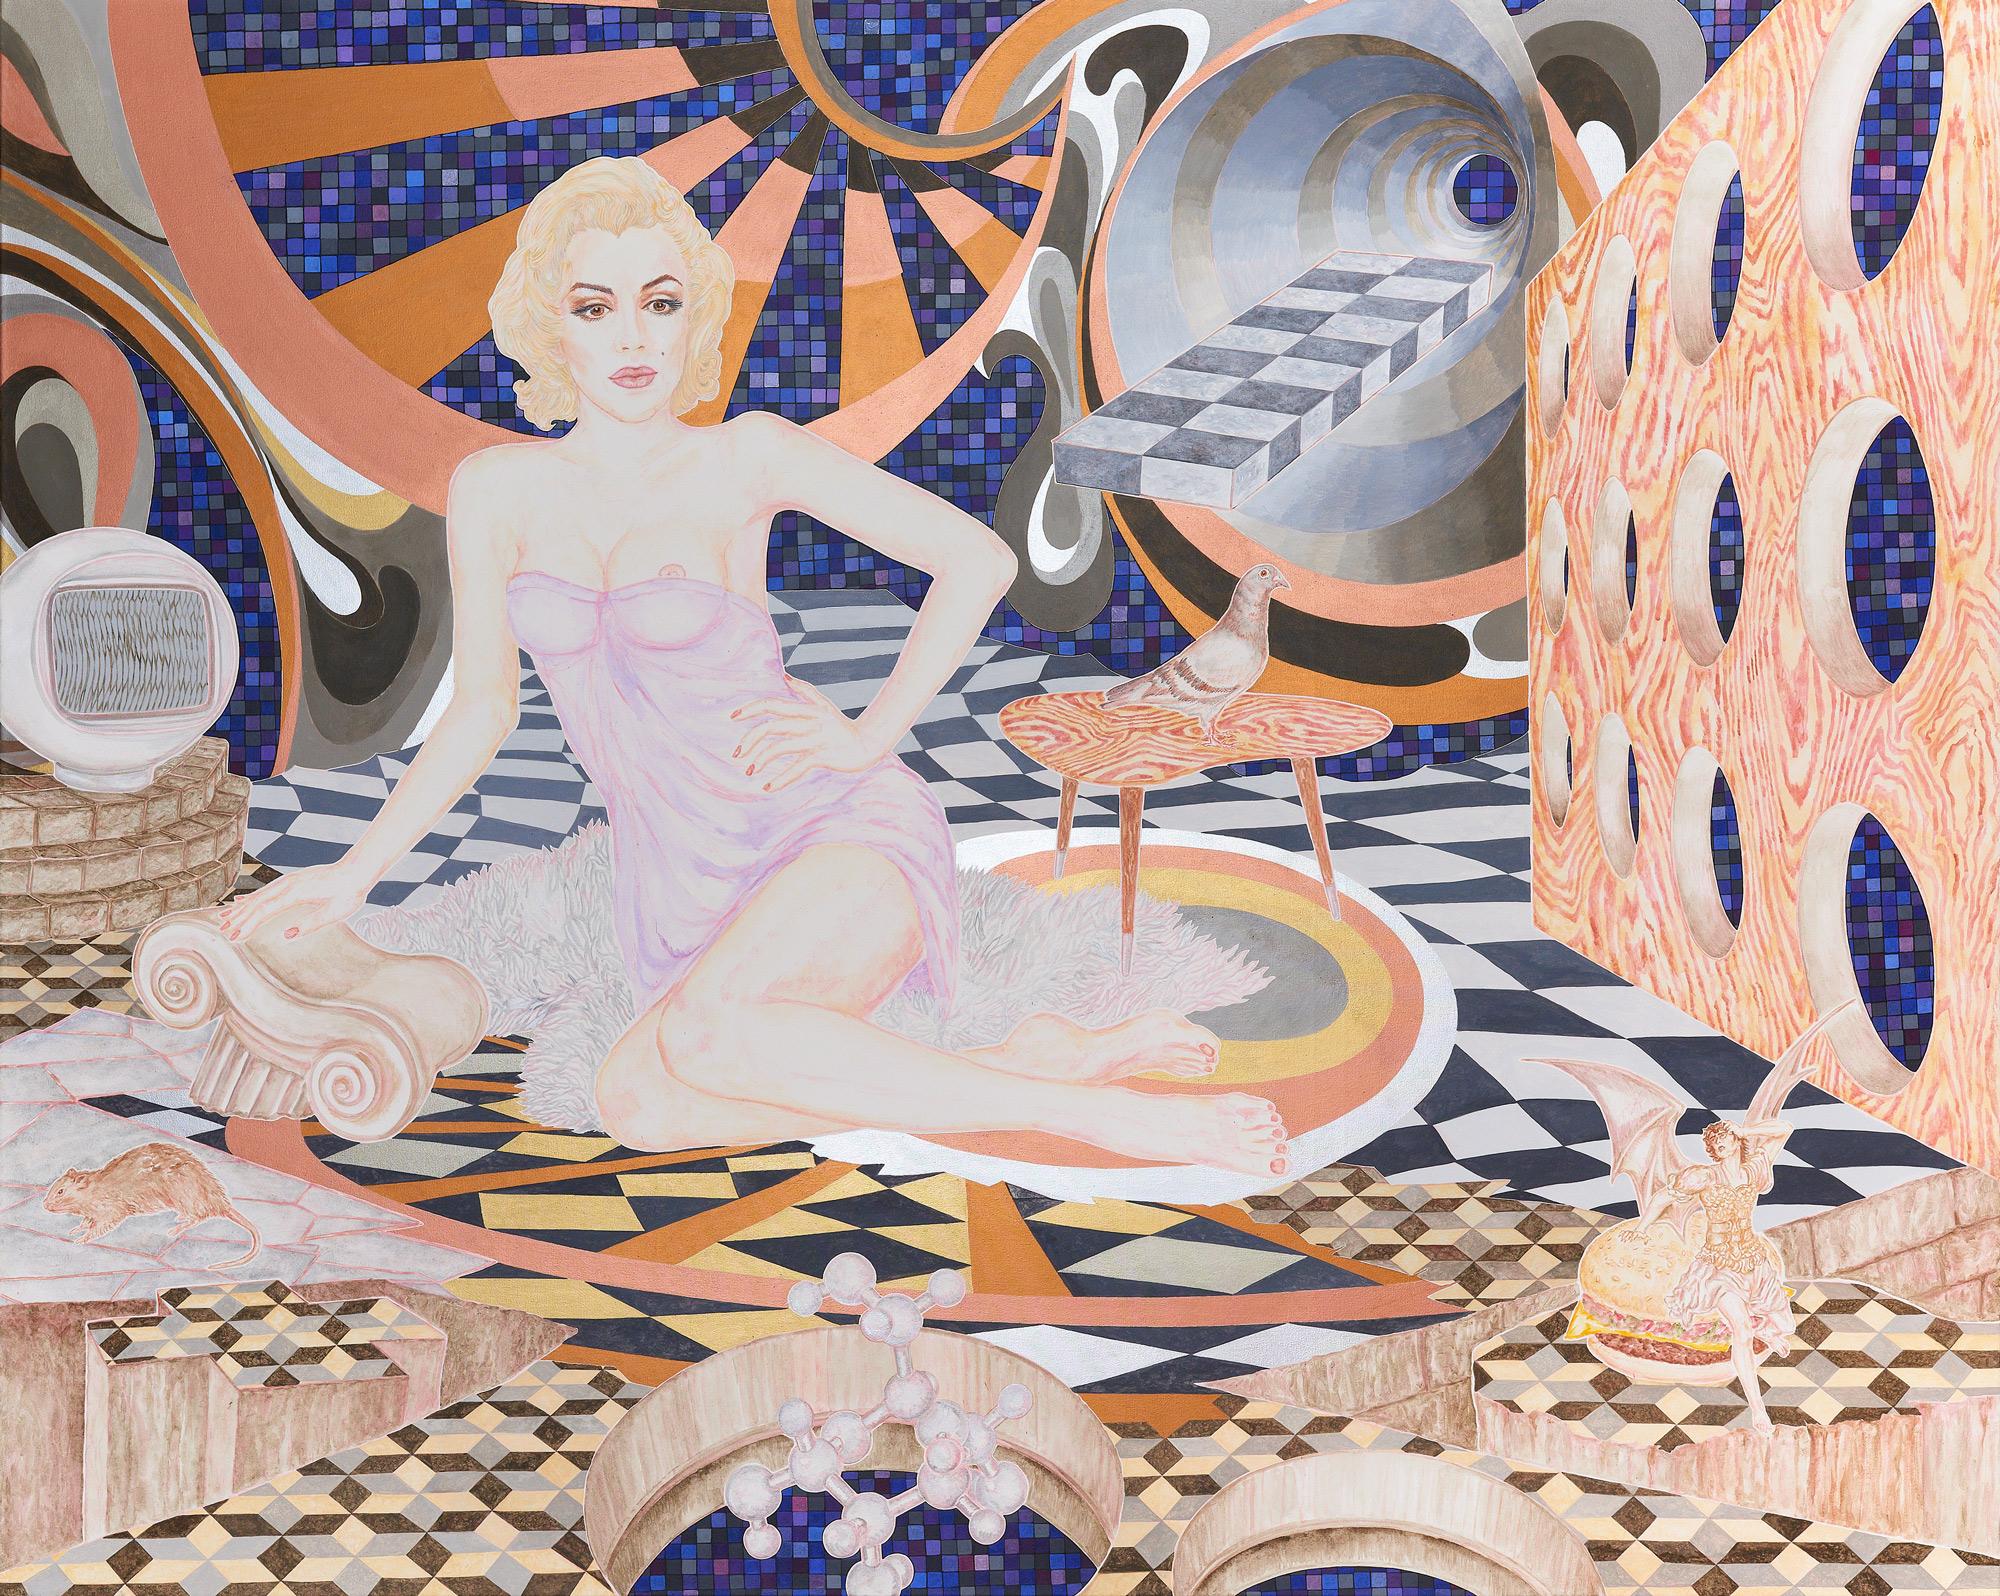 ABETZ & DRESCHER  Birthday 250 x 200 cm acrylic on canvas 2017